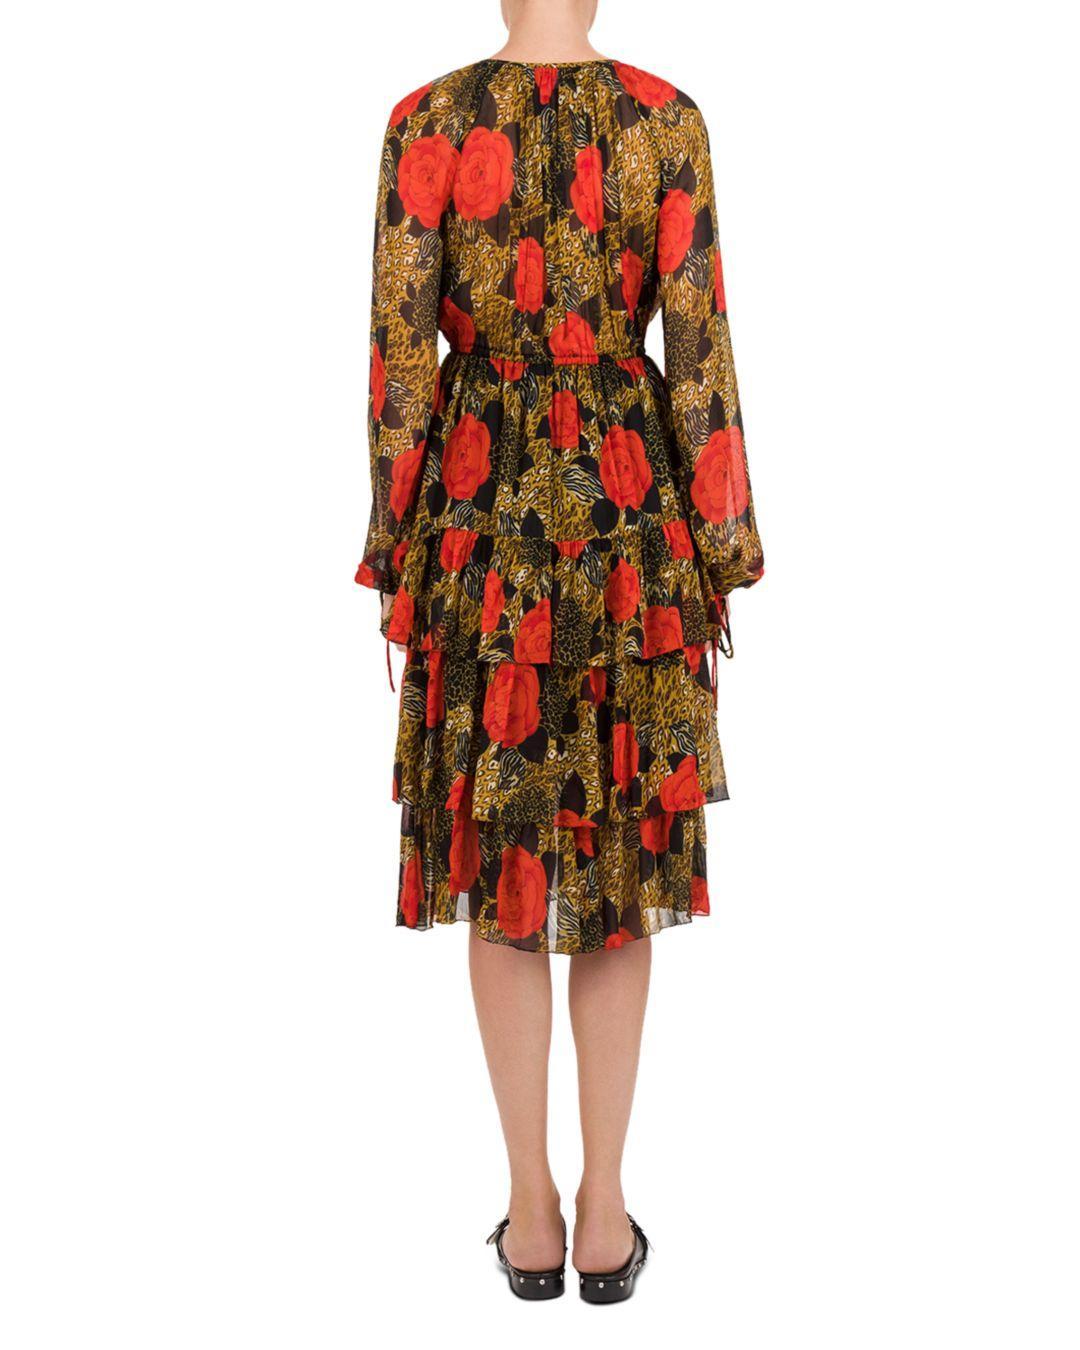 15a8df4db844 Lyst - The Kooples Jungle Flowers Printed Midi Dress in Red